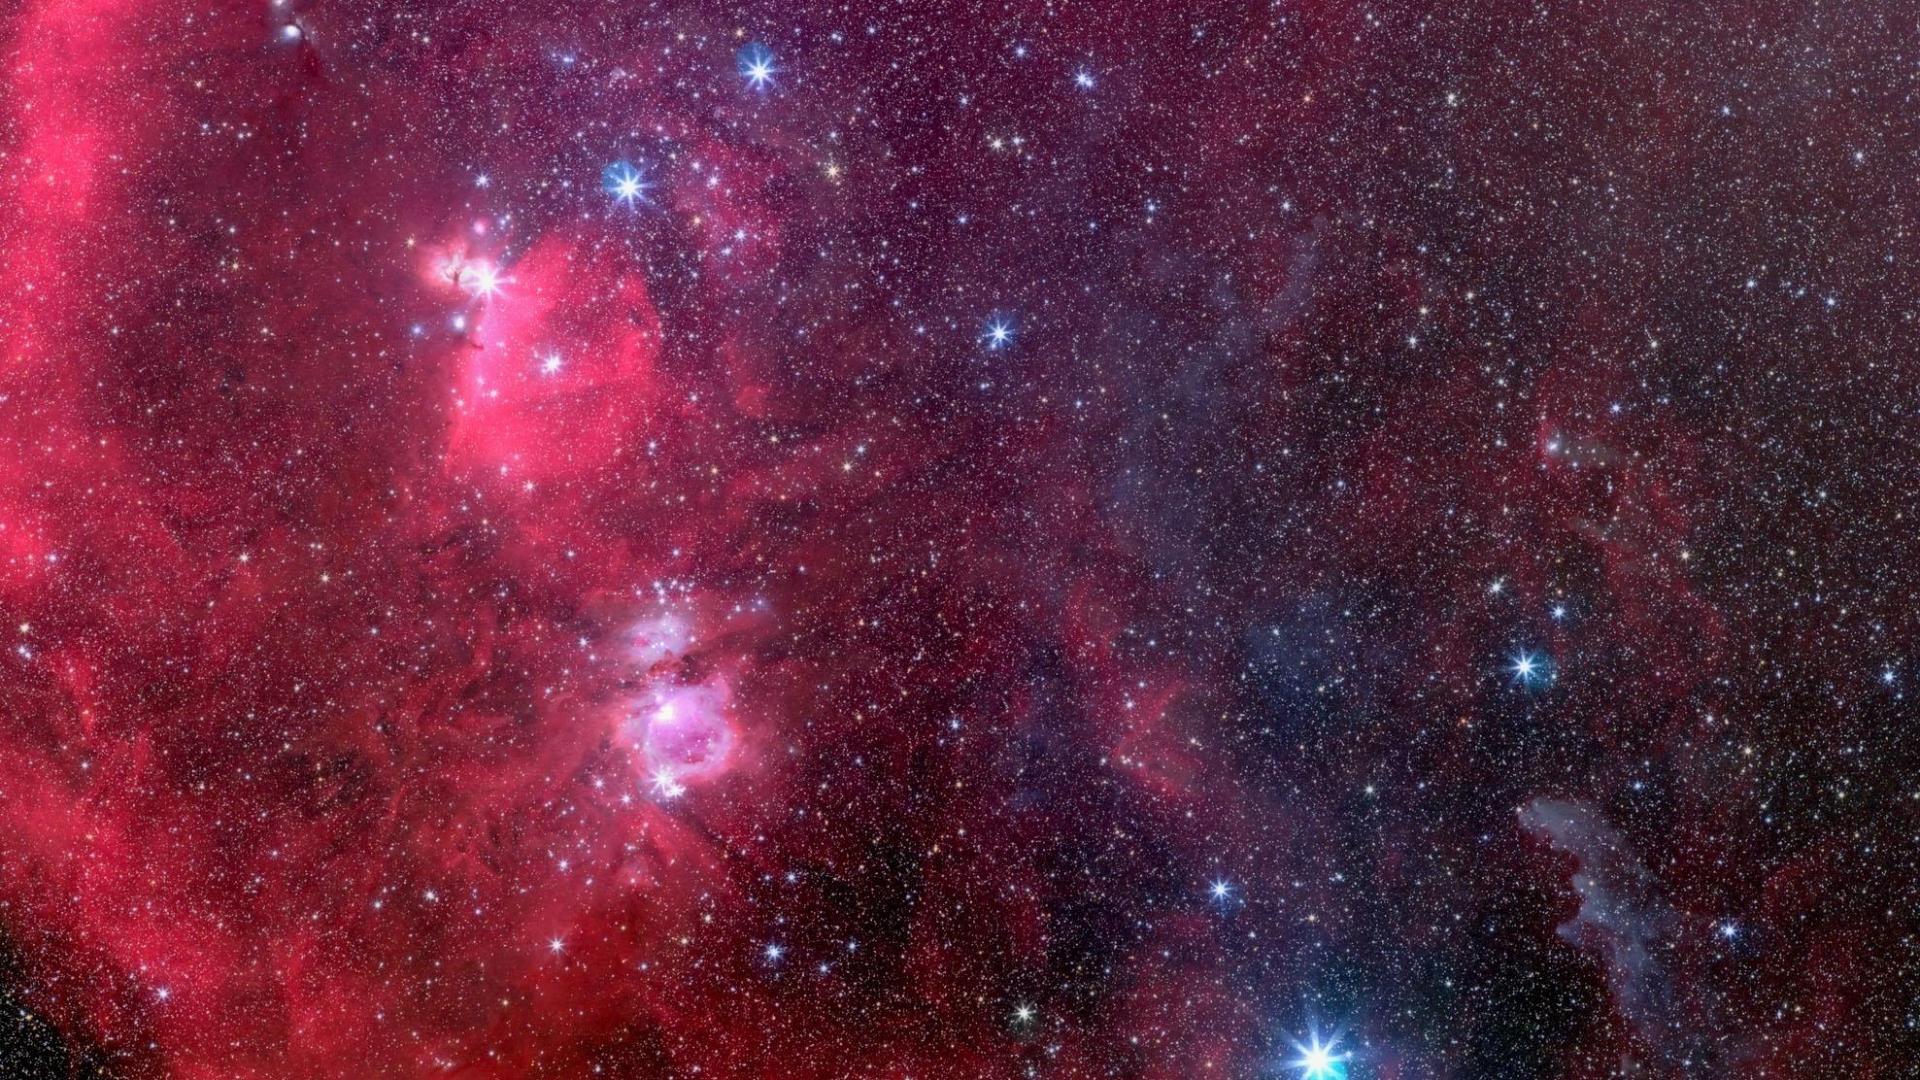 Free Download Space Stars Red Deep Hd Wallpaper 278 Hq Desktop